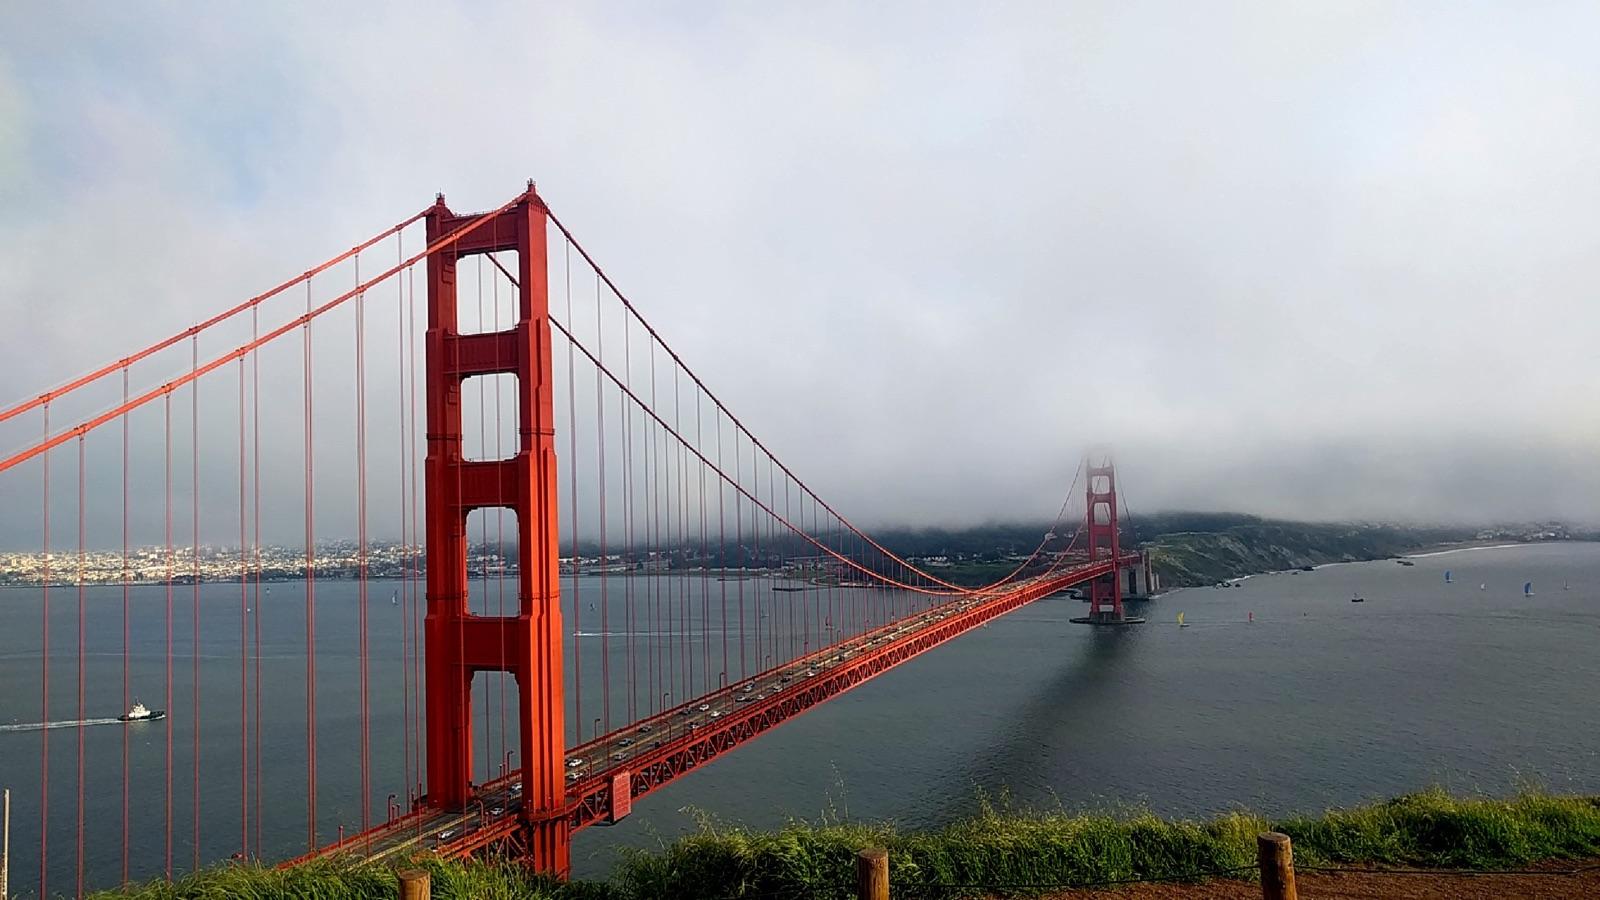 A photo of the Golden Gate Bridge taken by Iris' son.